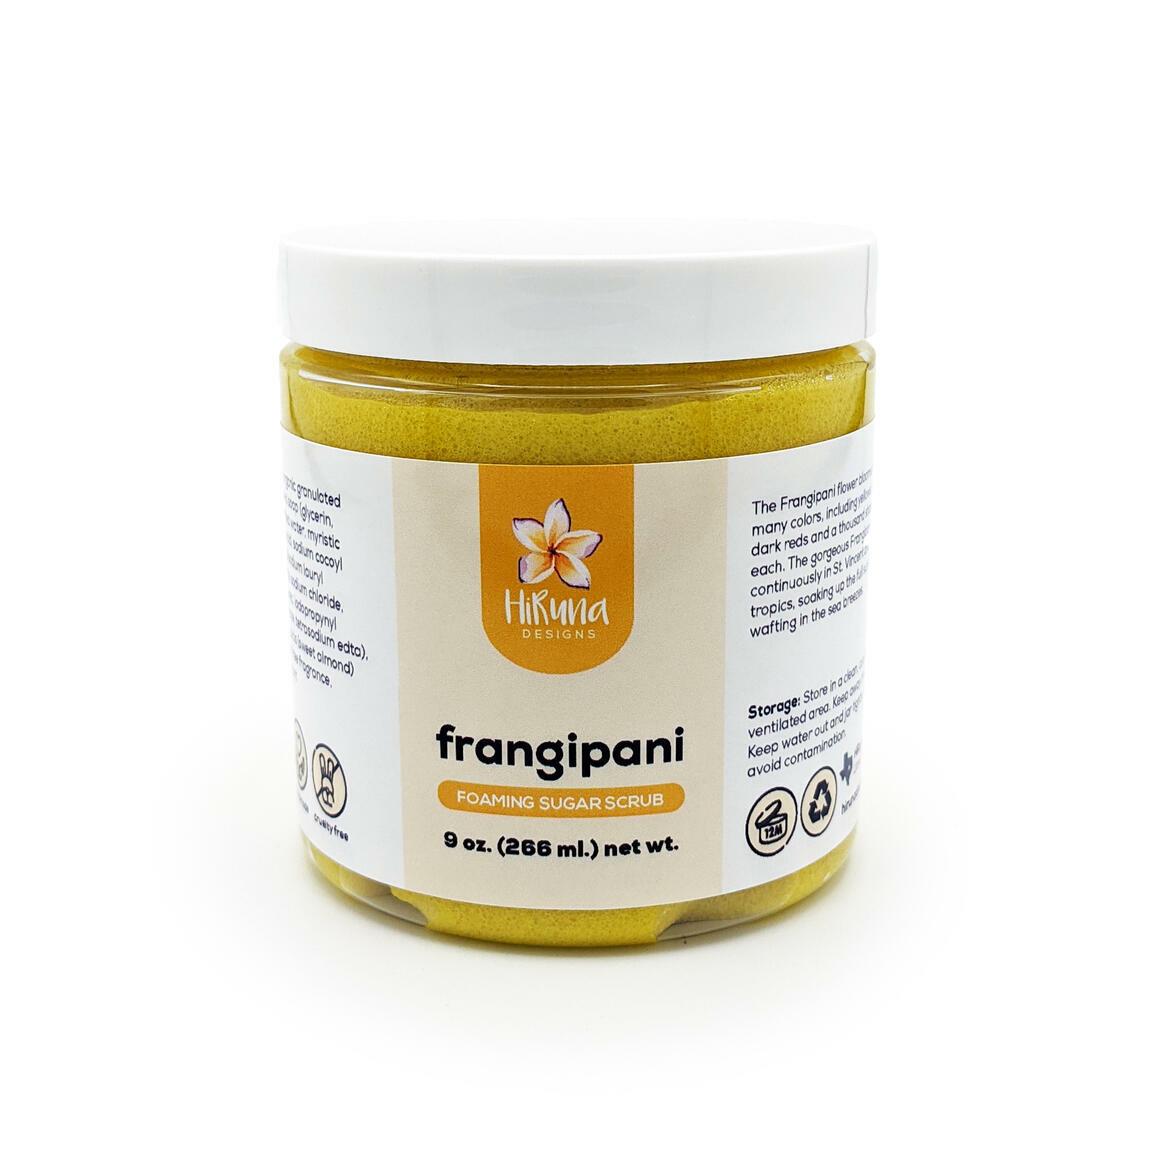 Frangipani - Foaming Sugar Scrub | Trada Marketplace